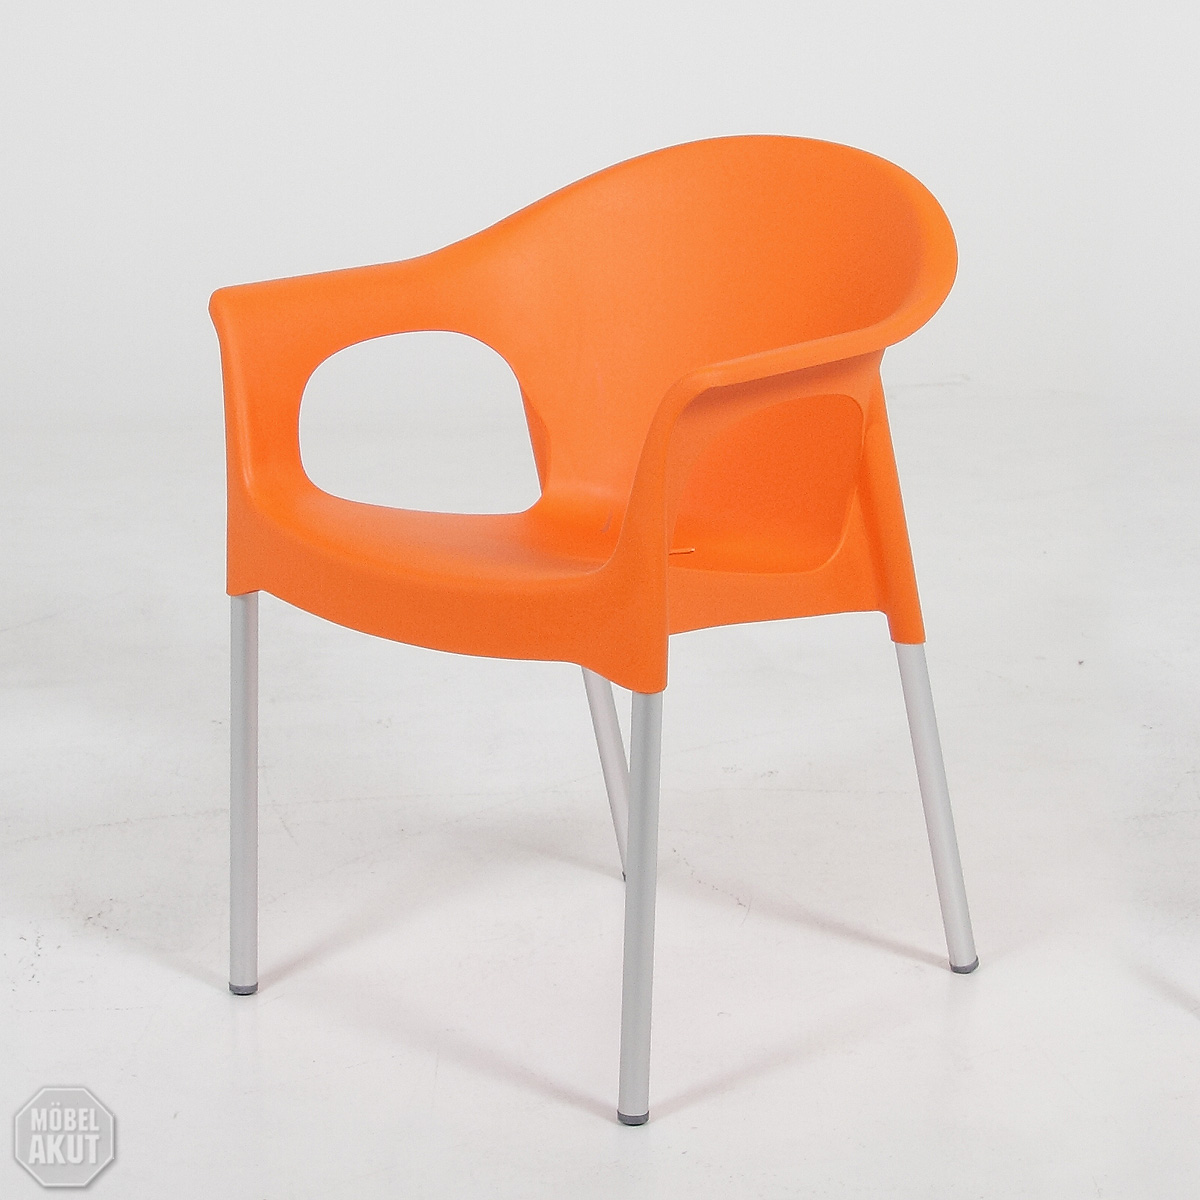 stuhl troja orange stapelstuhl outdoor geeignet ebay. Black Bedroom Furniture Sets. Home Design Ideas